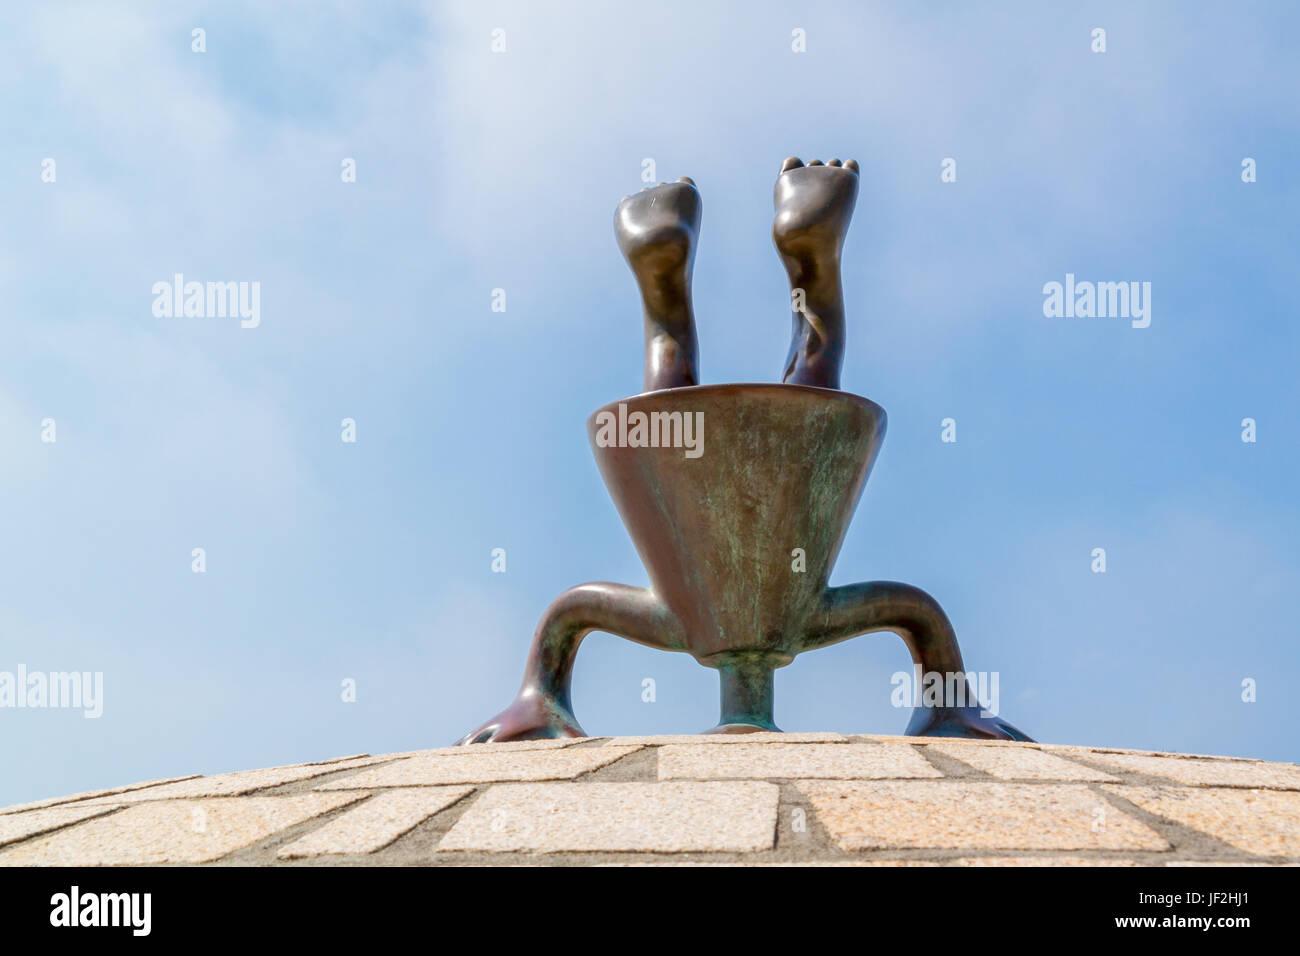 Bronze upside down figure, part of fairytale sculptures by the sea on boulevard of Scheveningen, The Hague, South - Stock Image